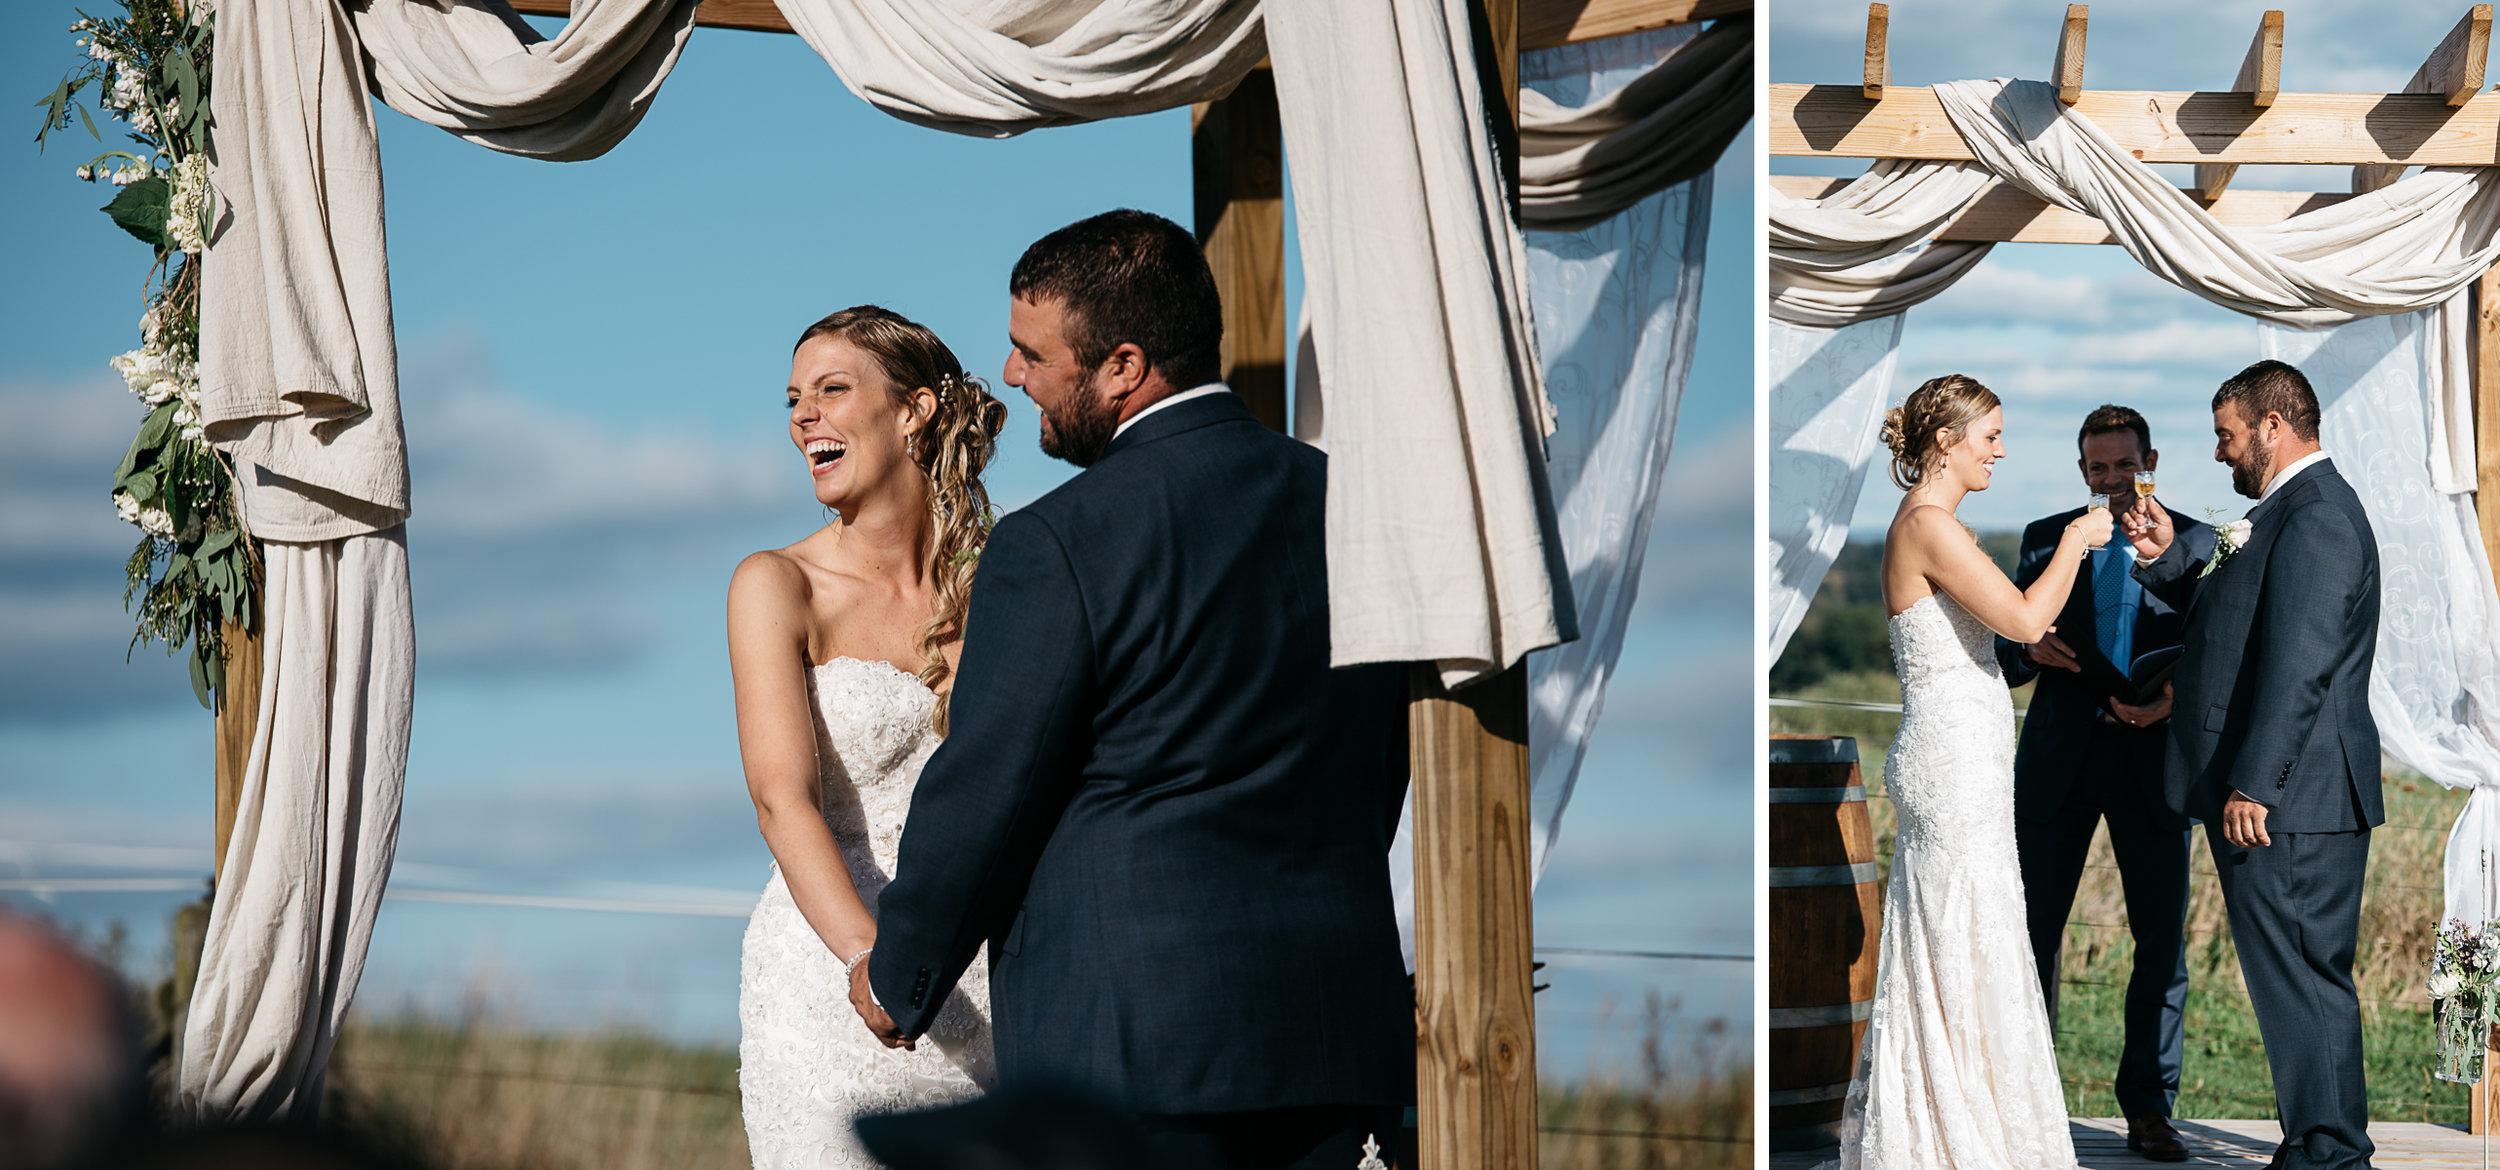 wedding ceremony the event barn at highland farms.jpg